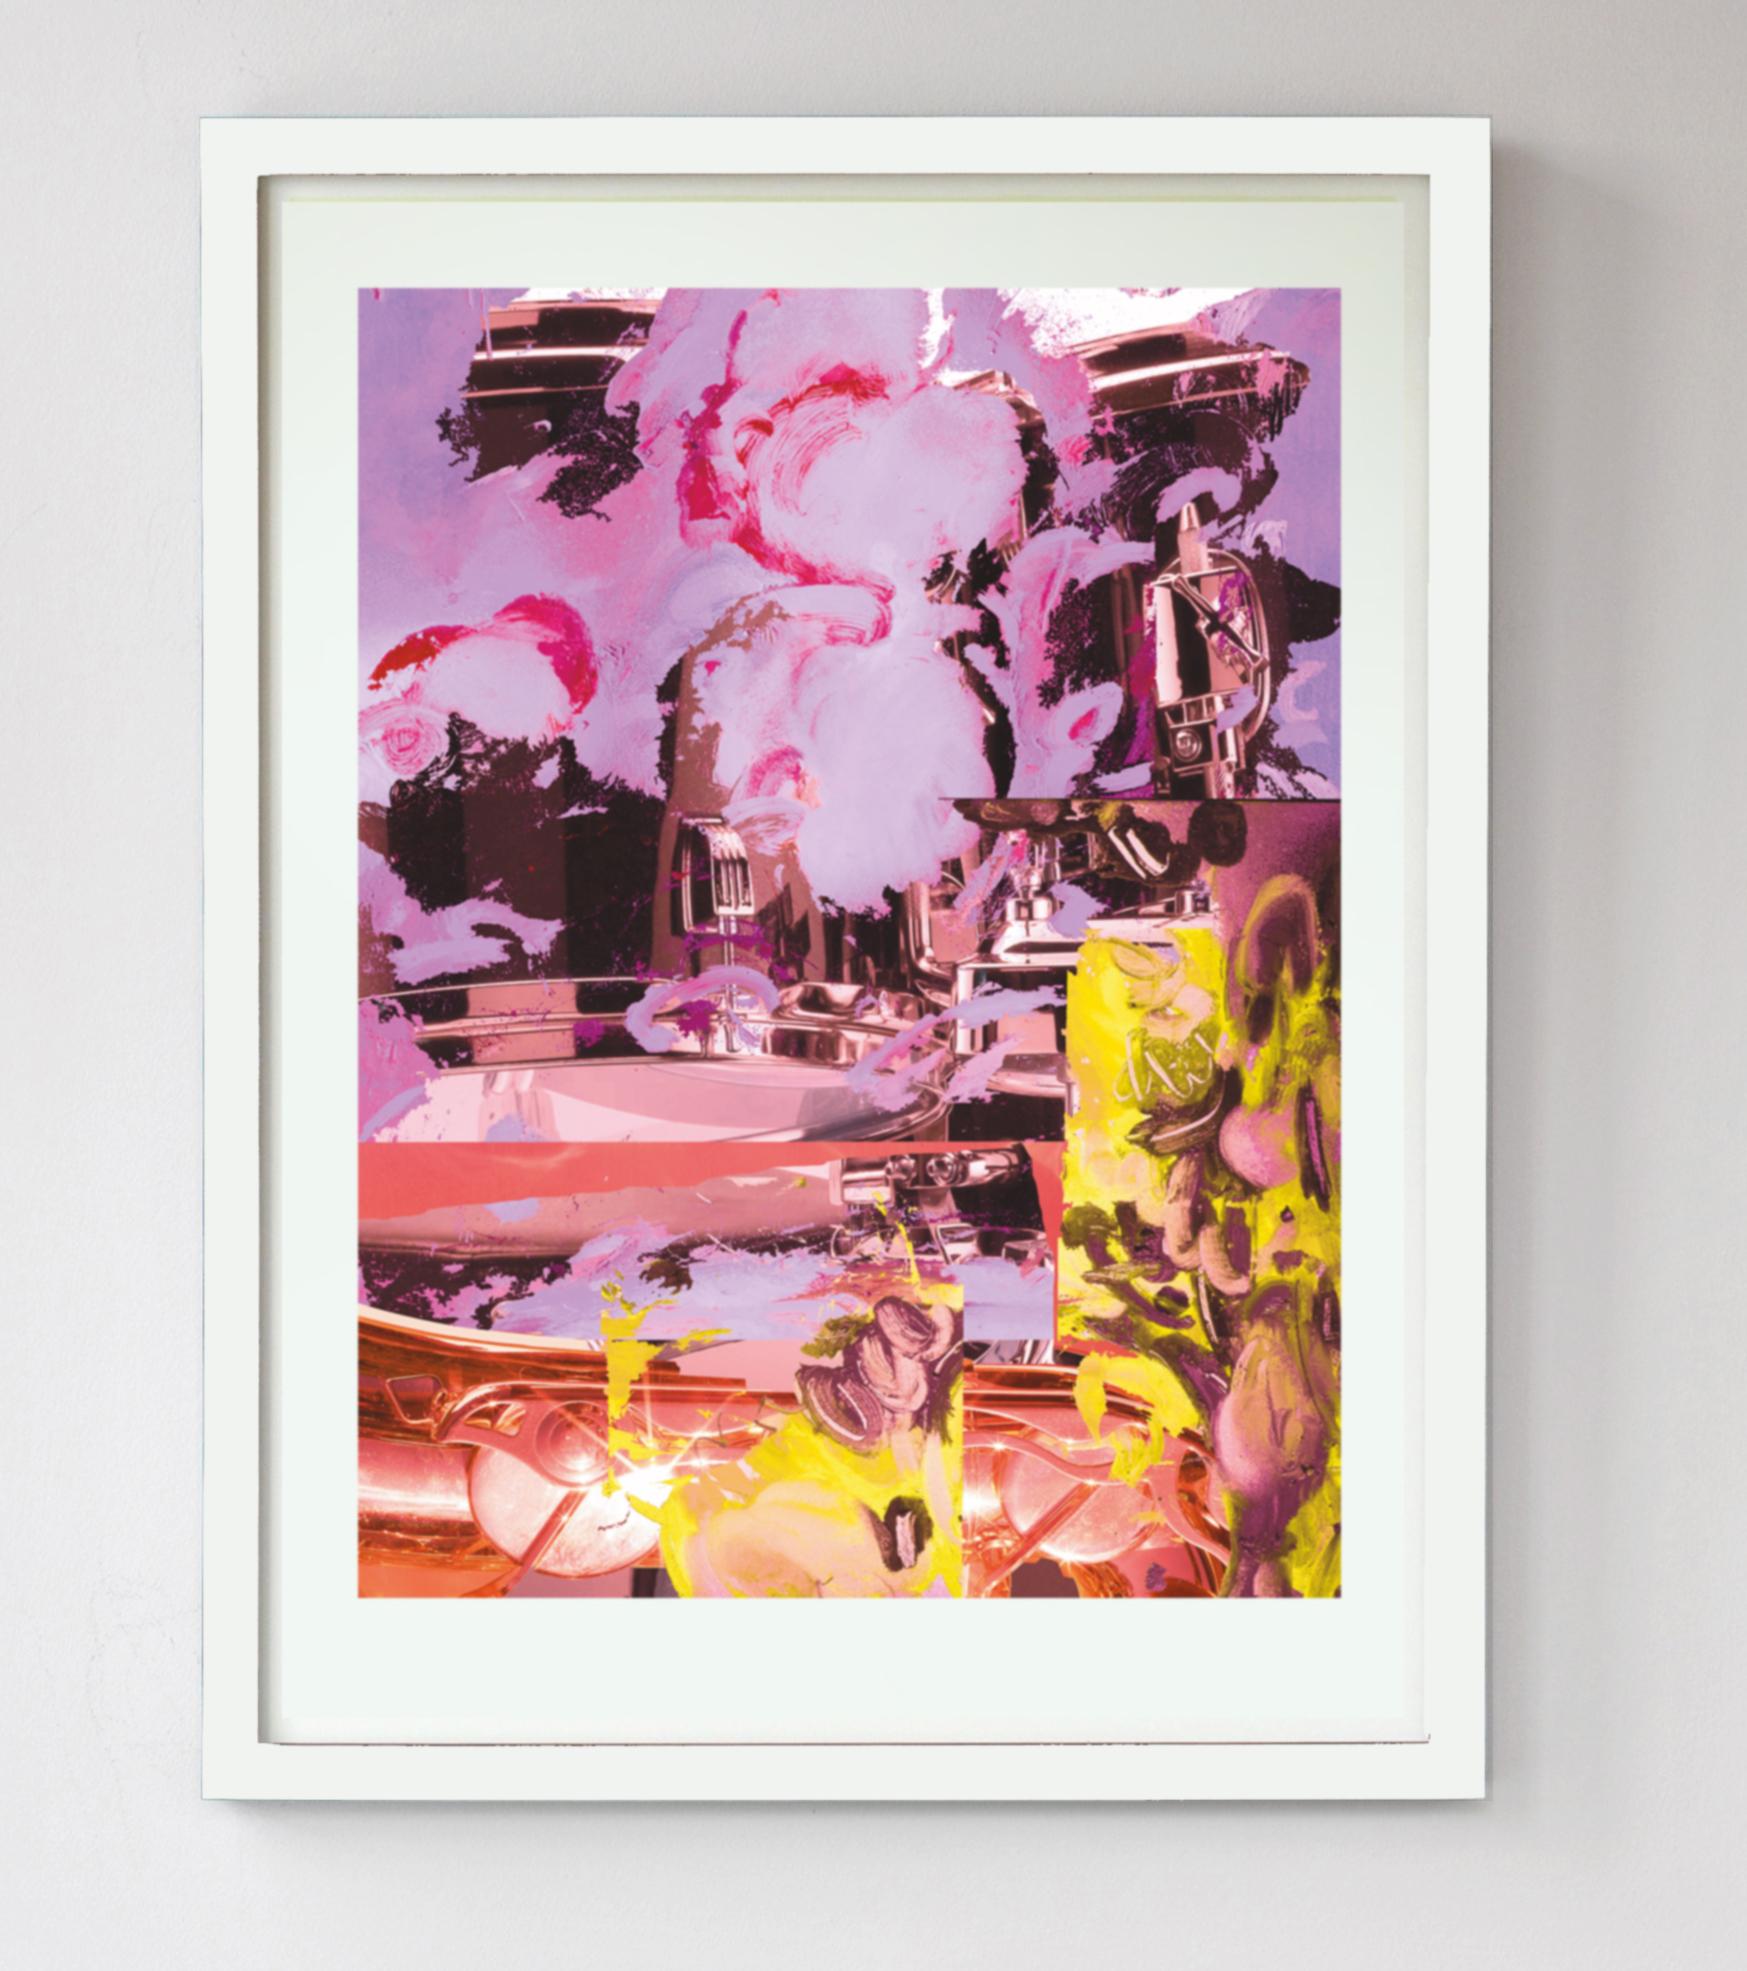 Edwin Burdis, How pink is my valley, 2017. Inkjet print on heavyweight paper. Framed. 90 x 114 cm.